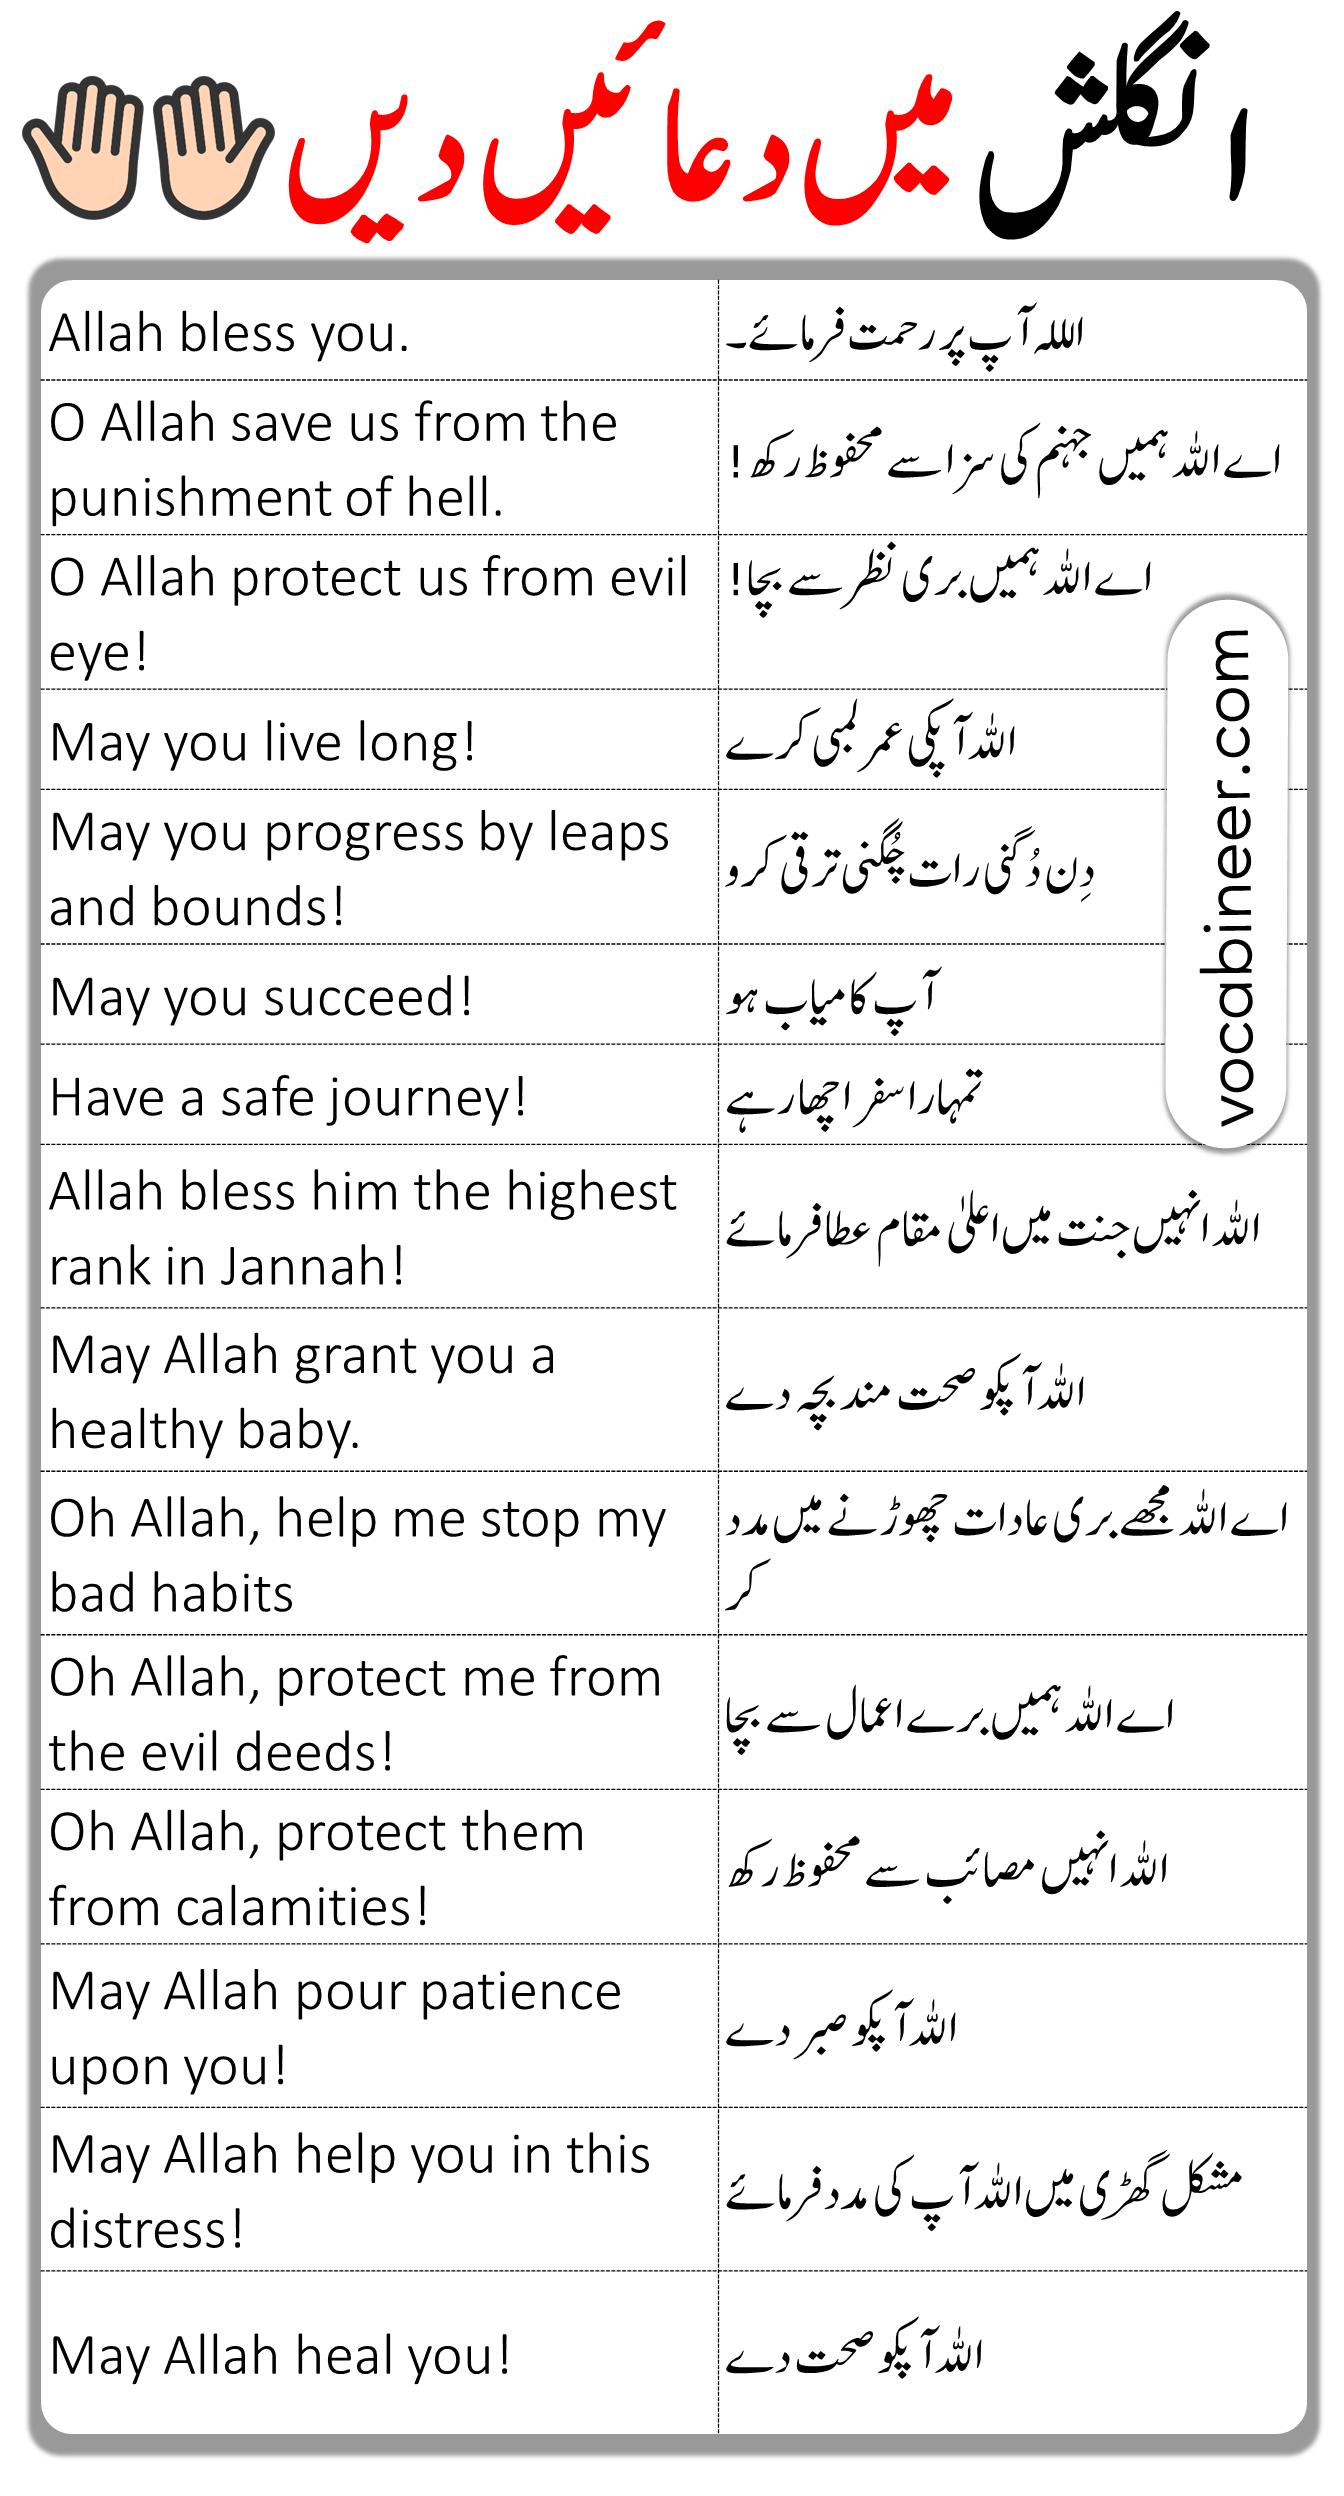 Dua Sentences with English Hindi and Urdu Translation for Muslims